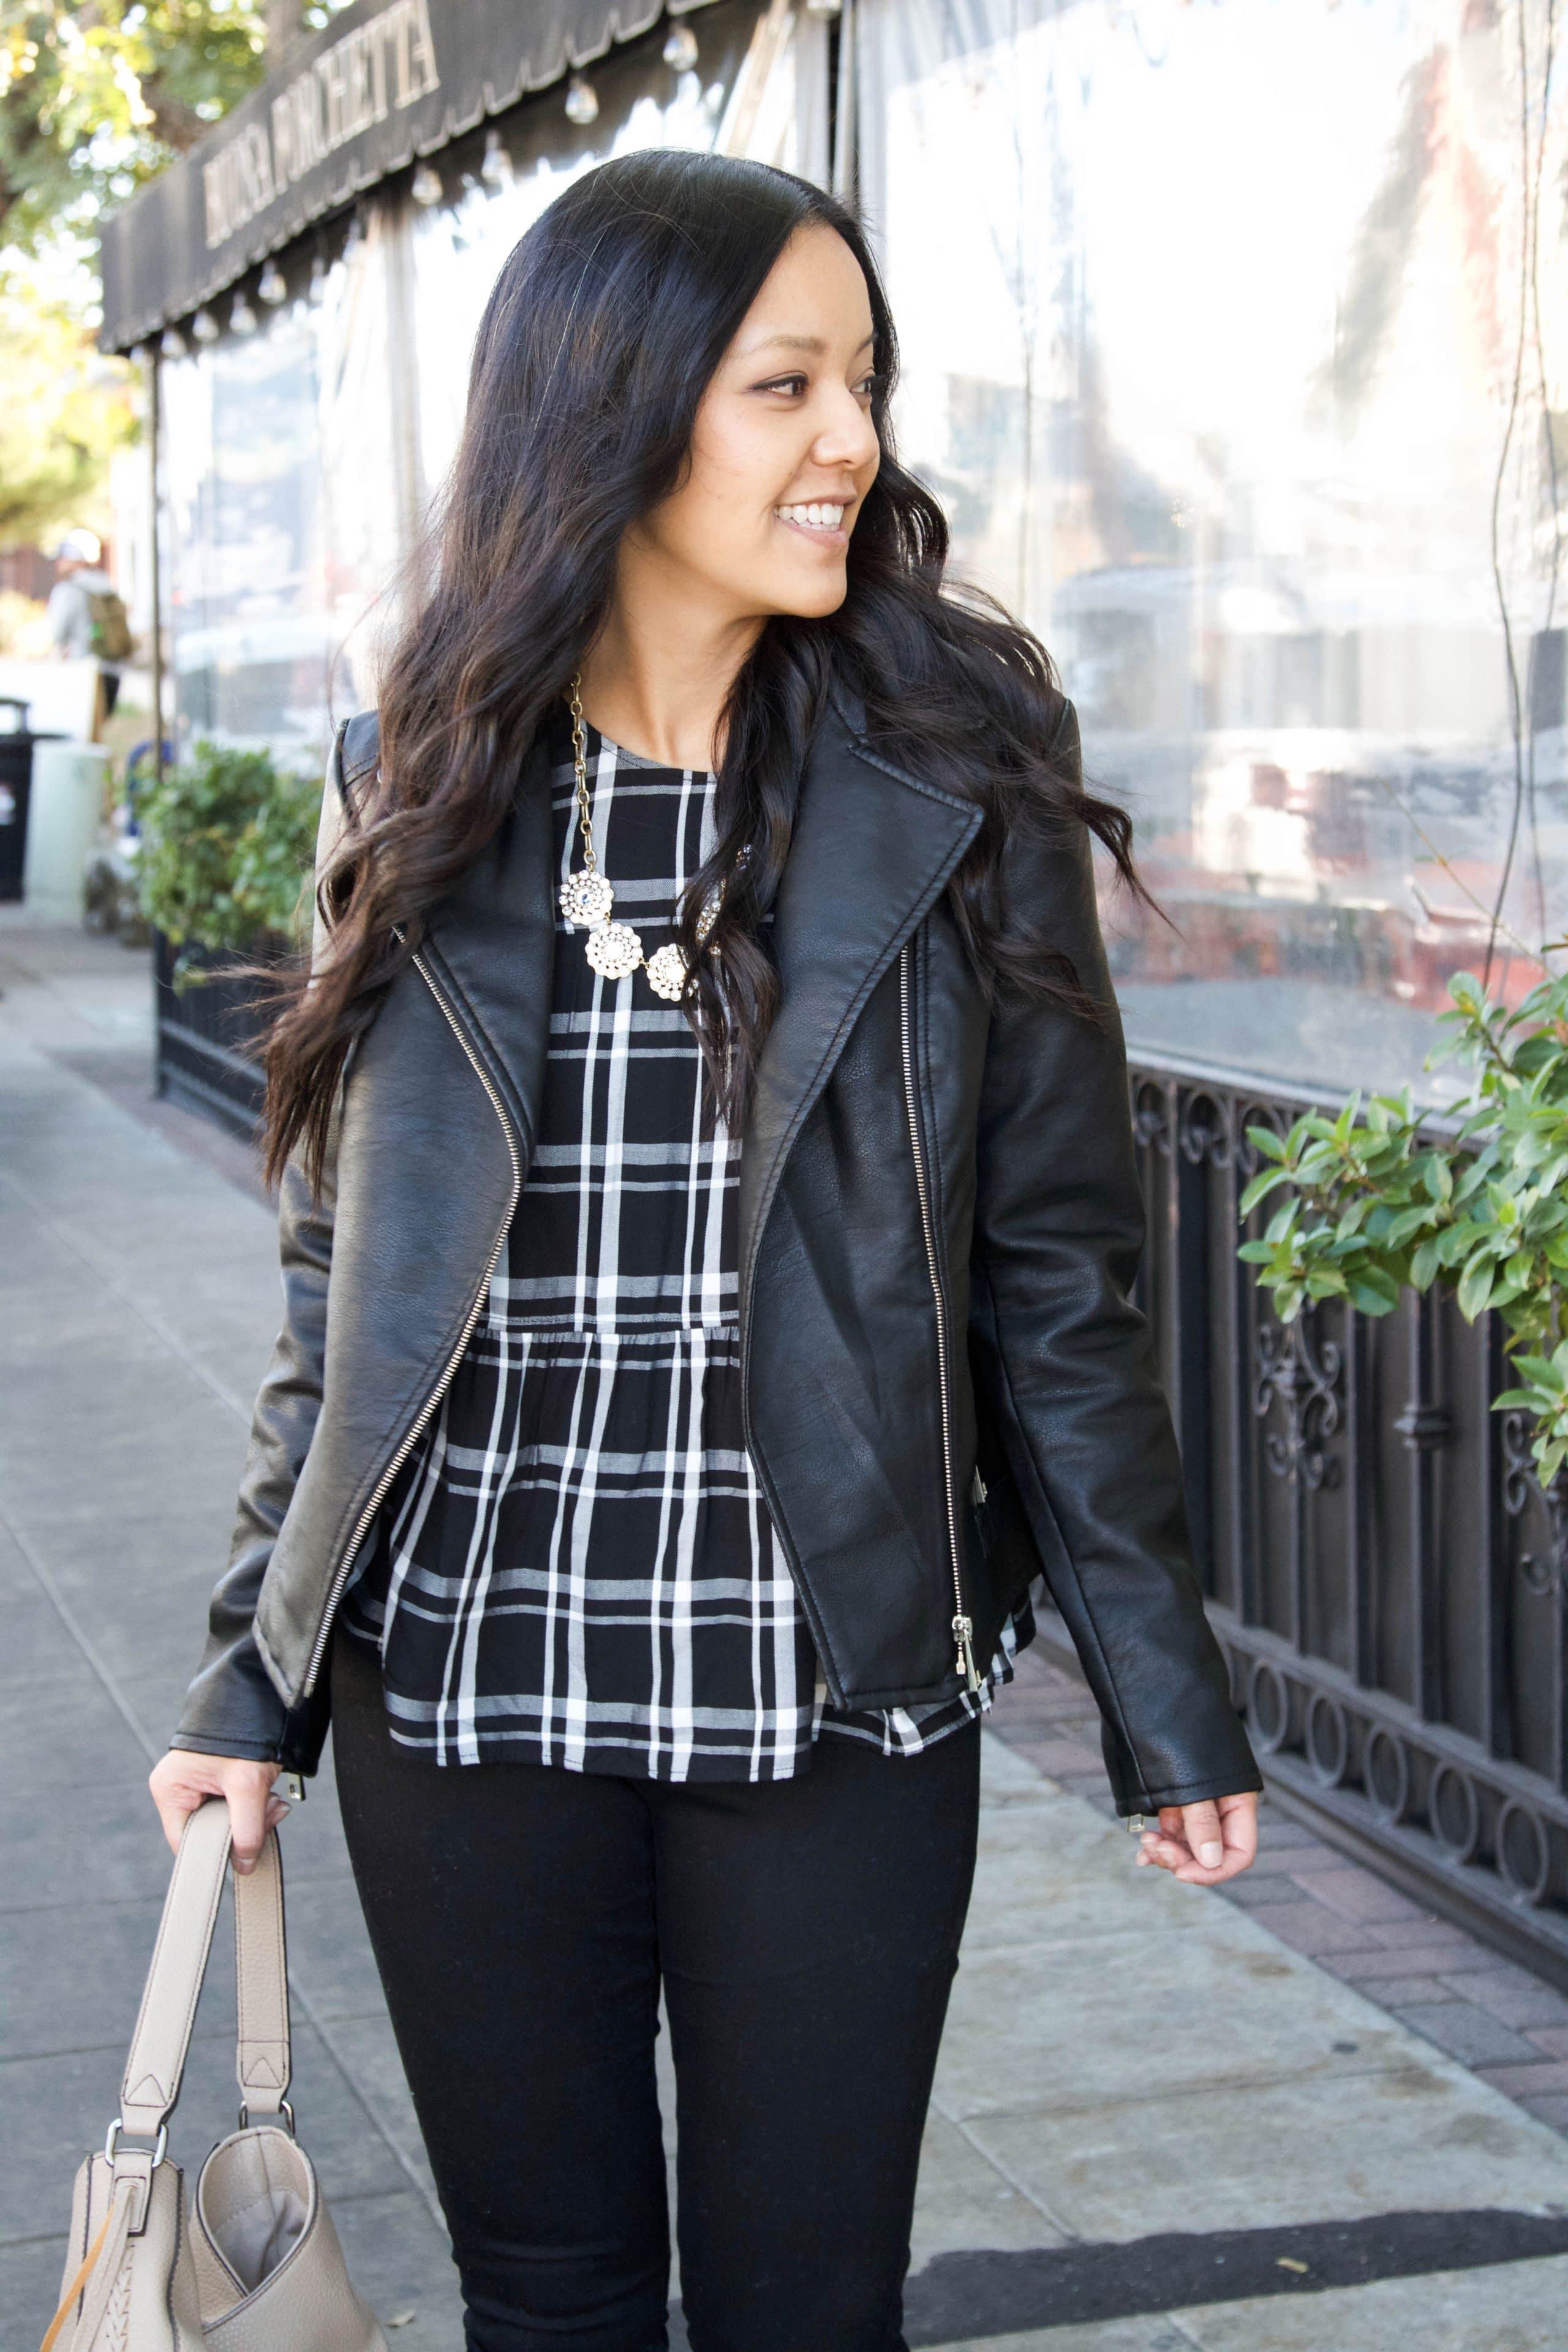 Black Plaid top + Black Moto + tan jacket + statement necklace